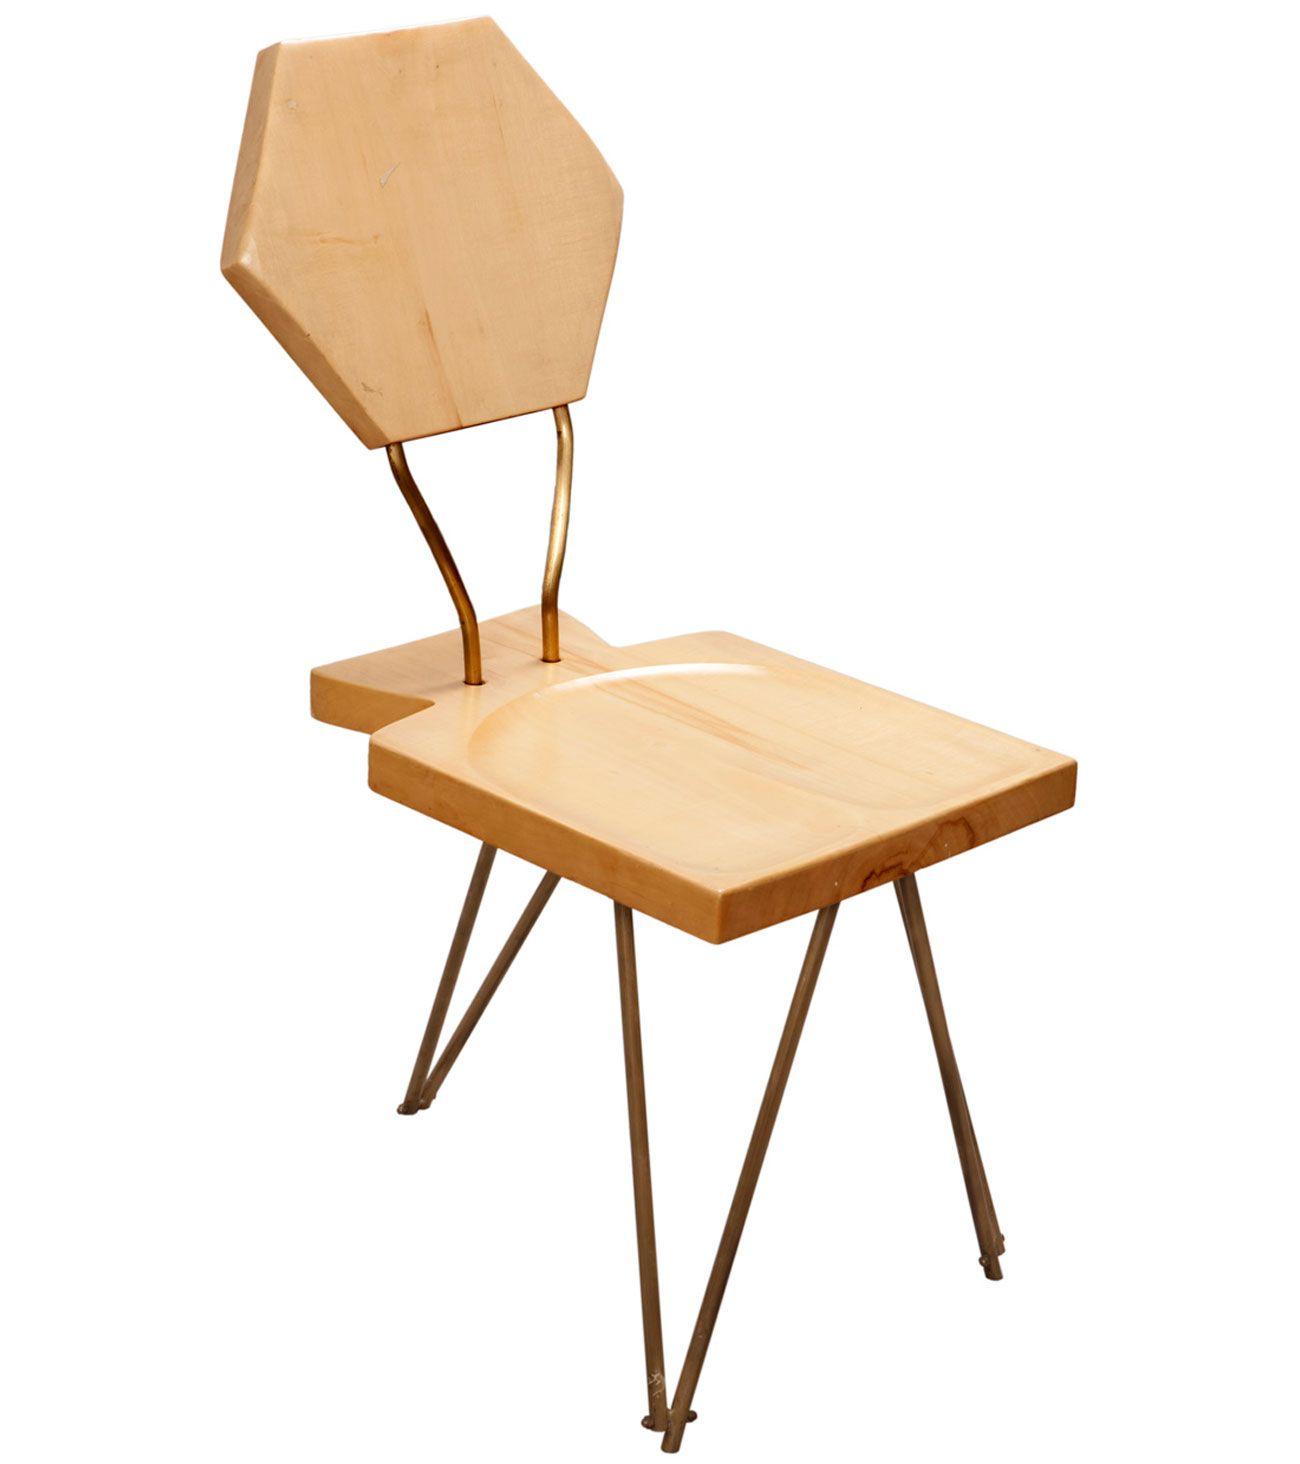 Carlo Mollino, Maple and Brass Chair, 1946.